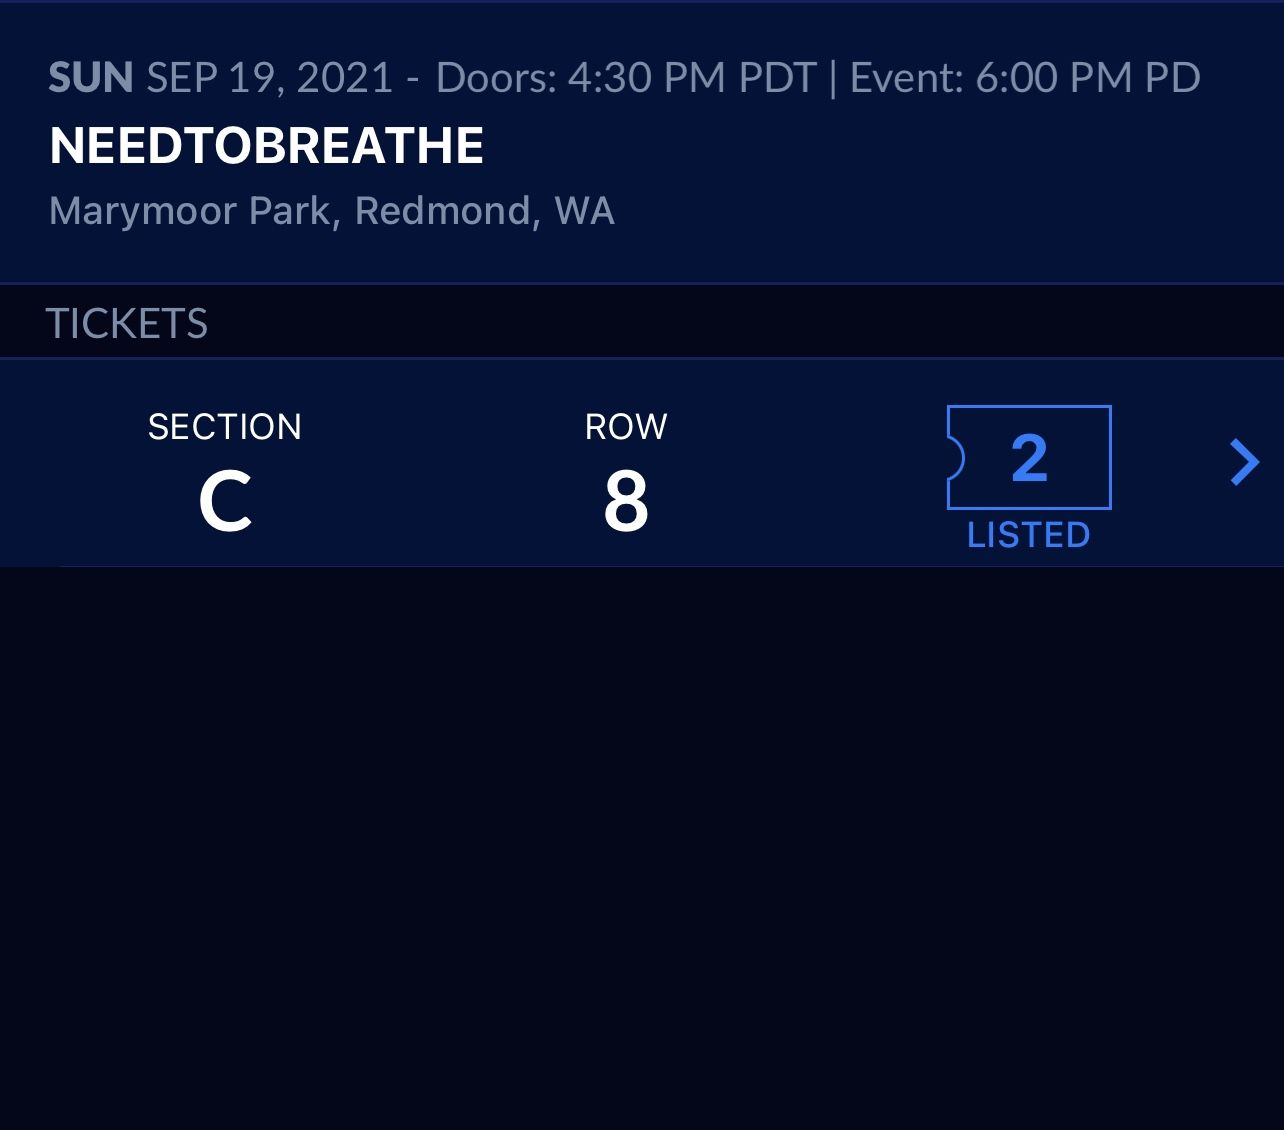 NEEDTOBREATHE, 2 Tickets Section C Row 8, Marymoor Park